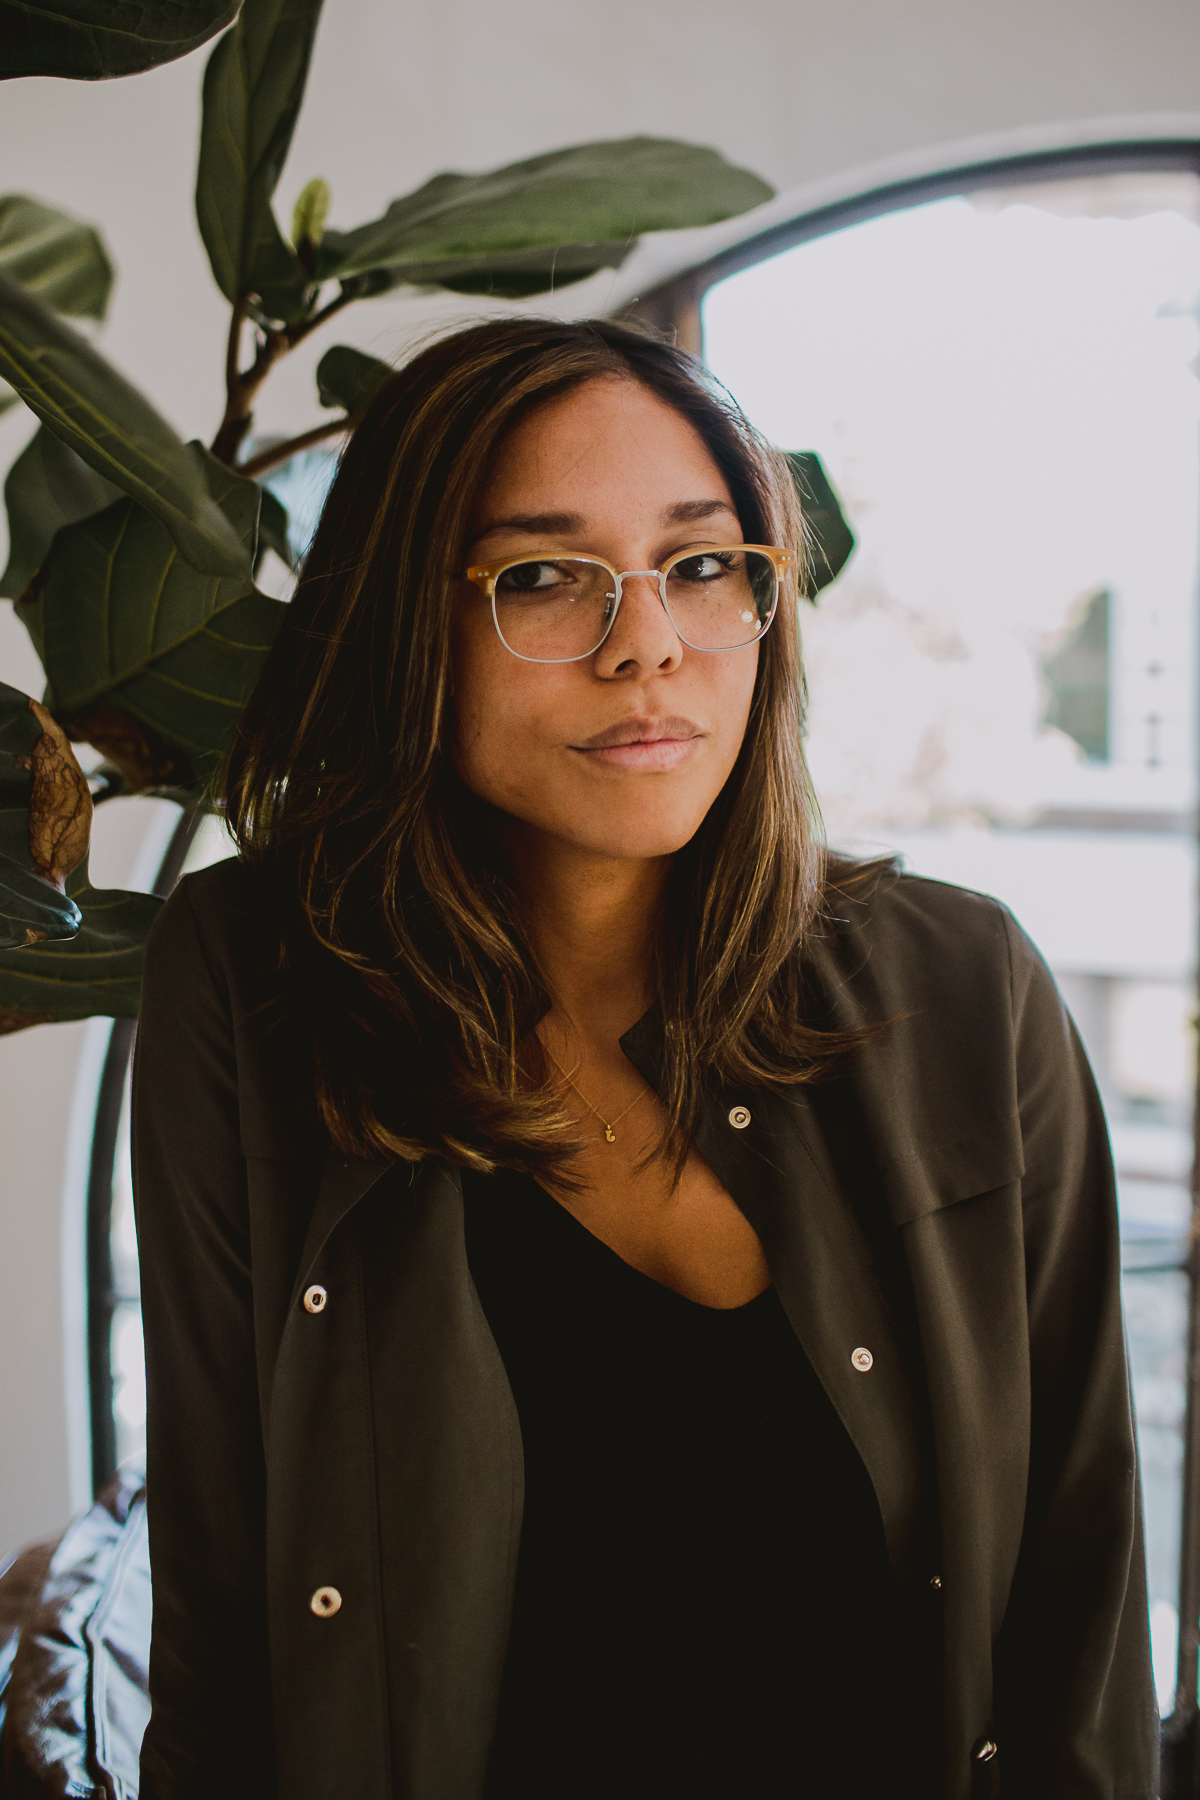 jonna-humphries-kelley-raye-tribe-and-york-los-angeles-branding-photographer-77.jpg